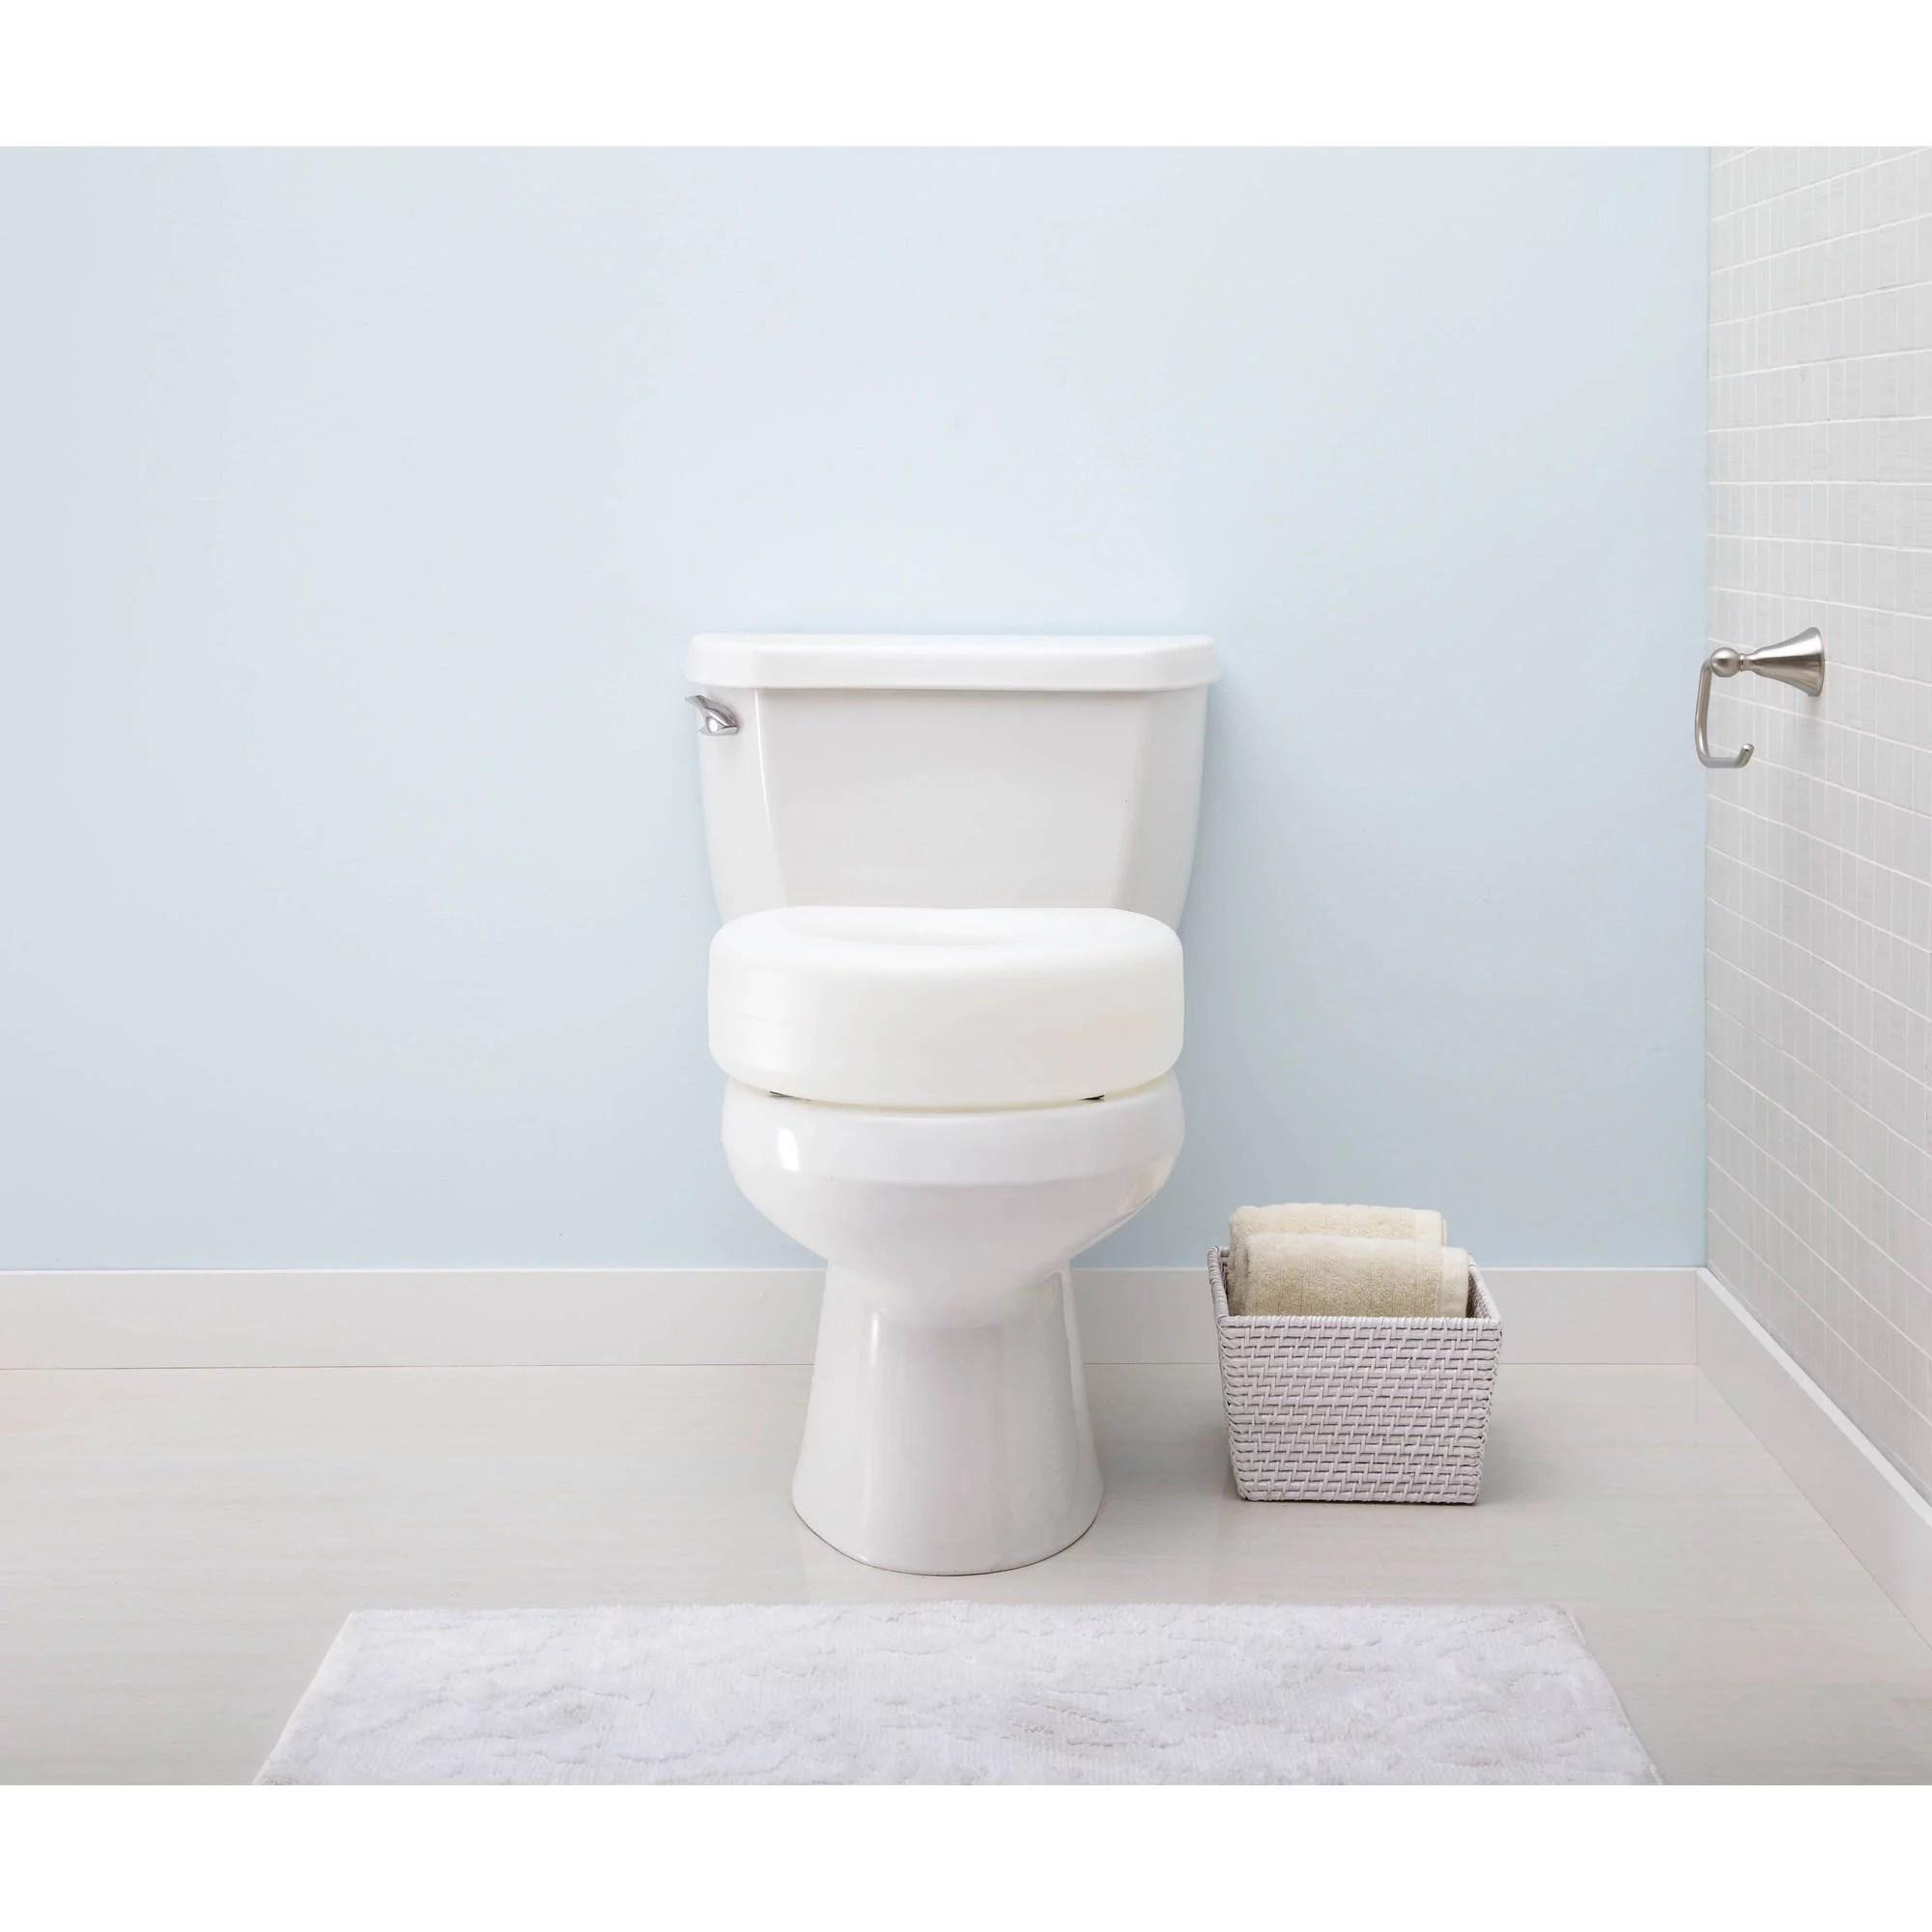 Medline Raised Toilet Seat Contoured Plastic Walmart Com Walmart Com